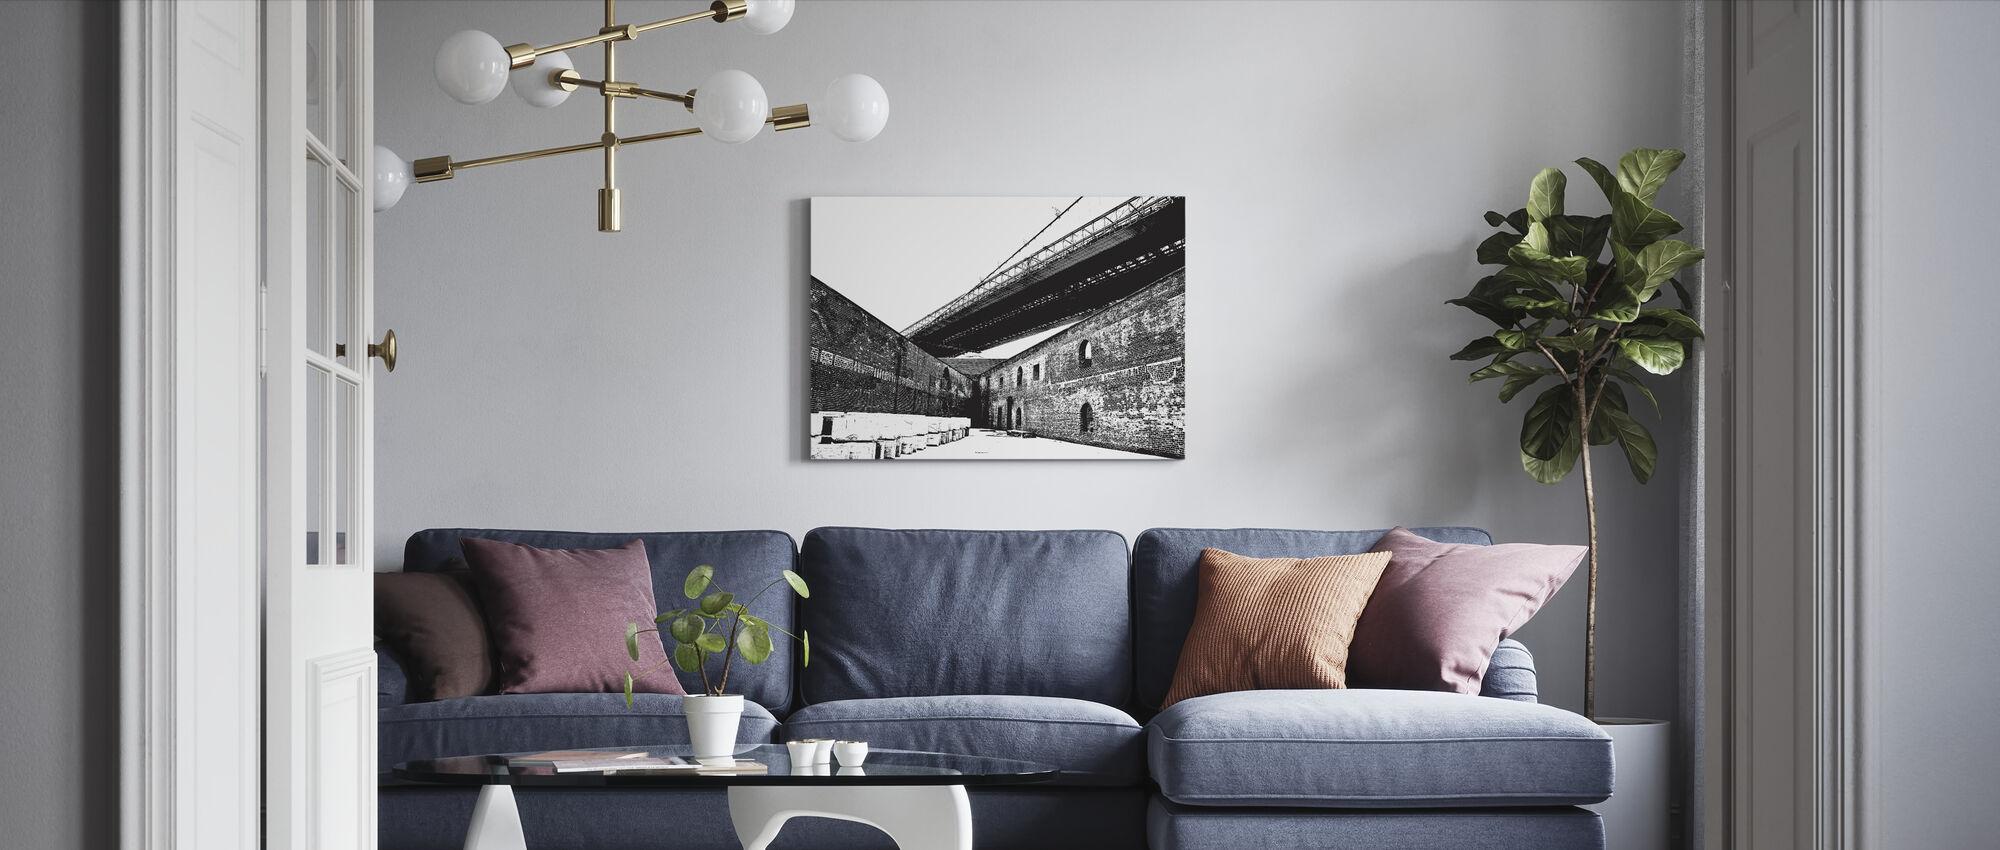 Structuur - Canvas print - Woonkamer